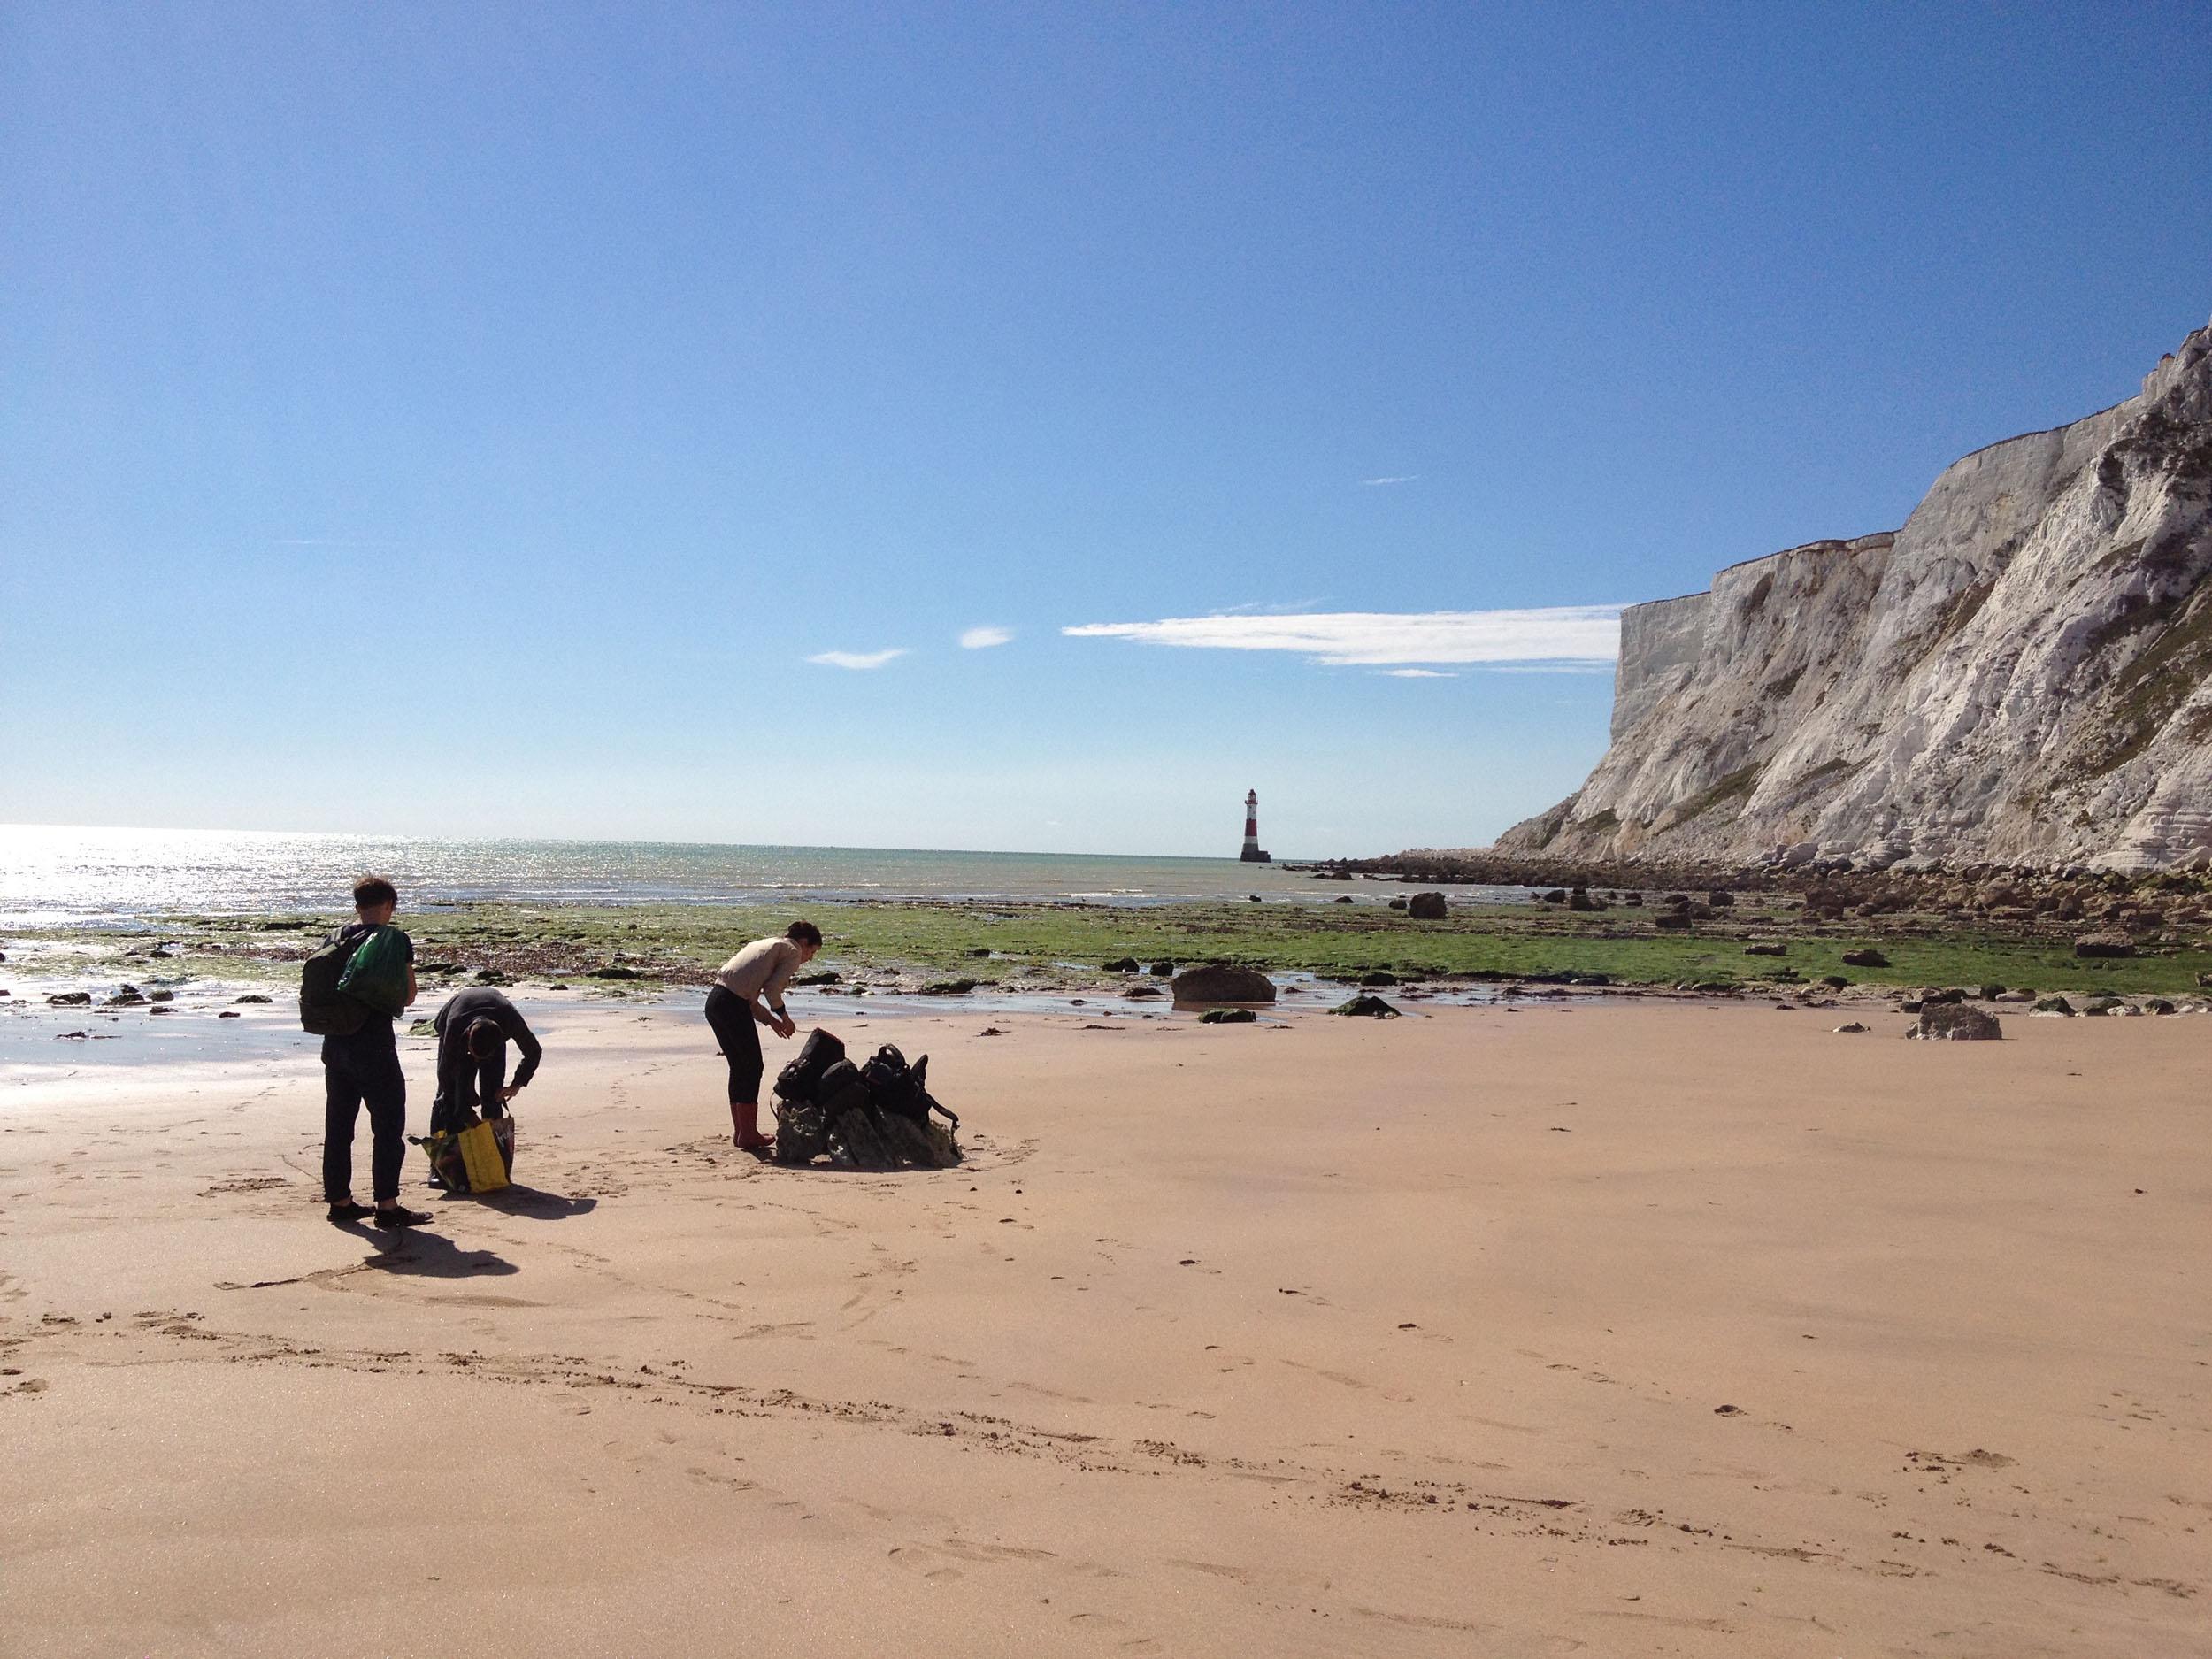 Glithero team foraging seaweed on the beach